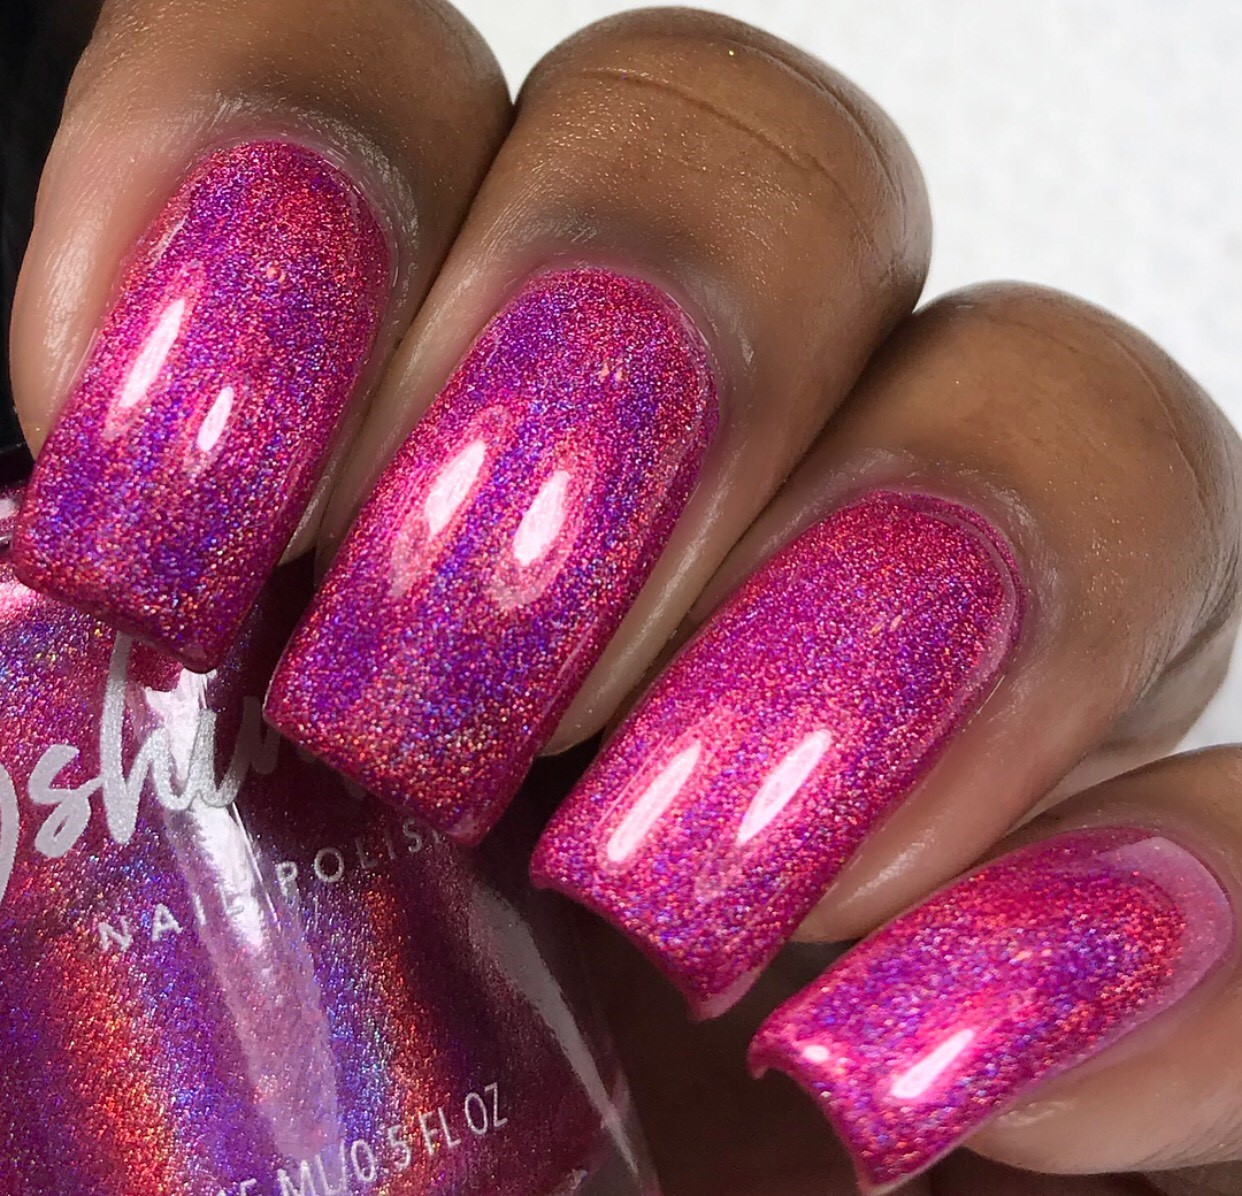 Wander-ful World Pink Linear Holographic Nail Polish